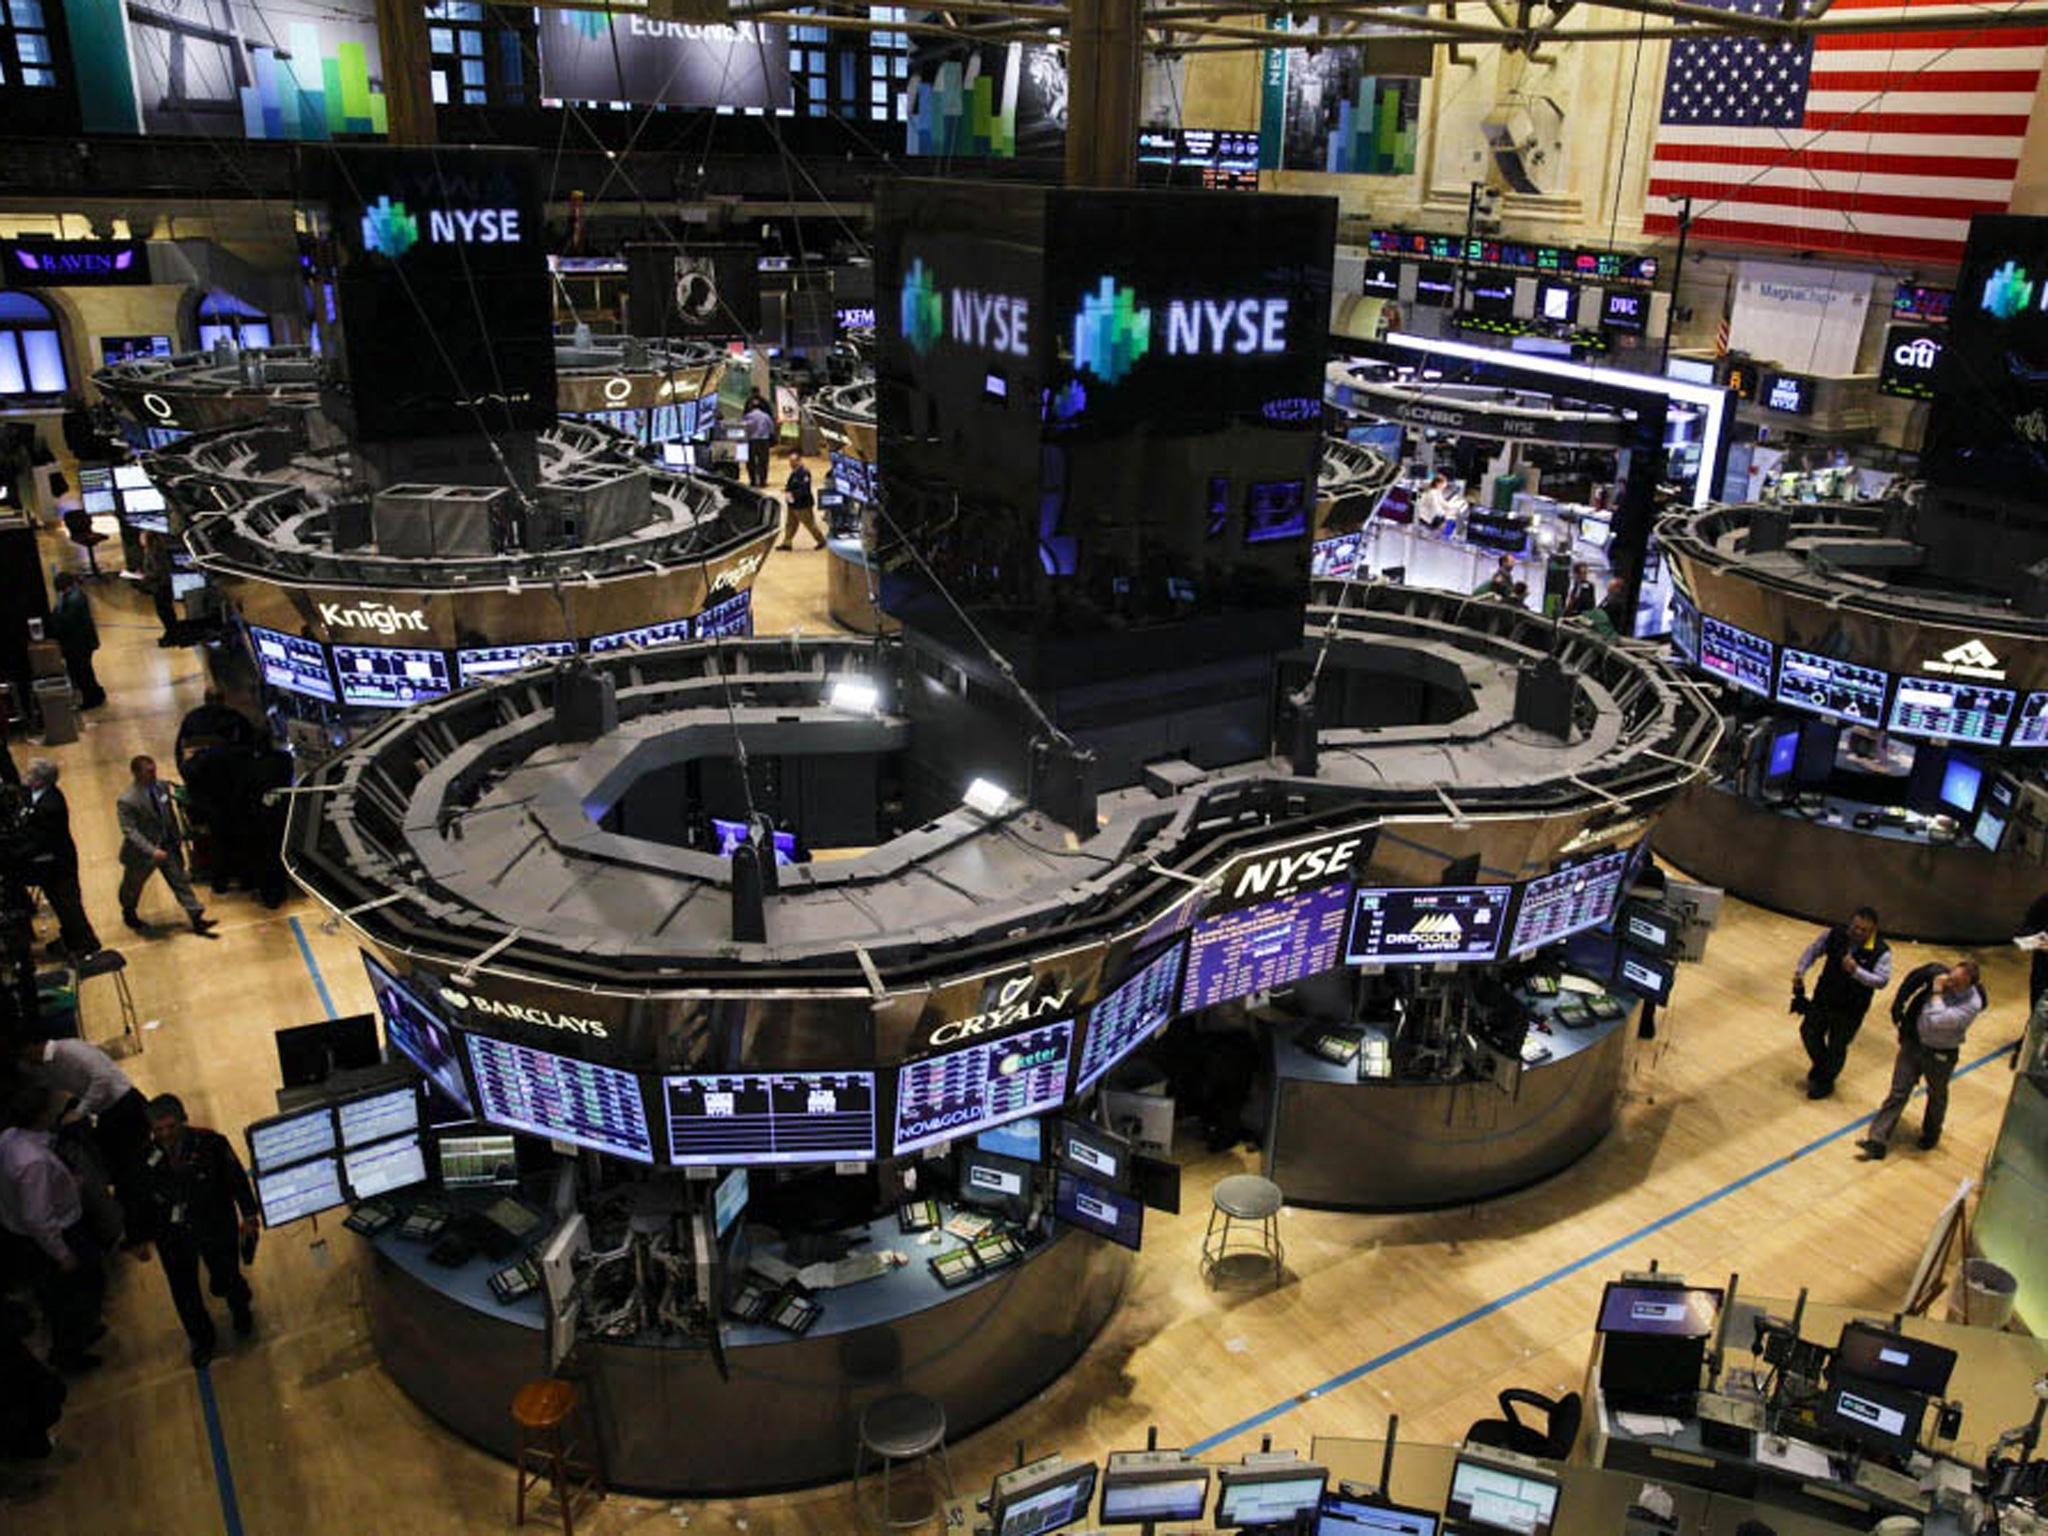 Charitybuzz Nyse York Stock Exchange Tour - Lot 1201500